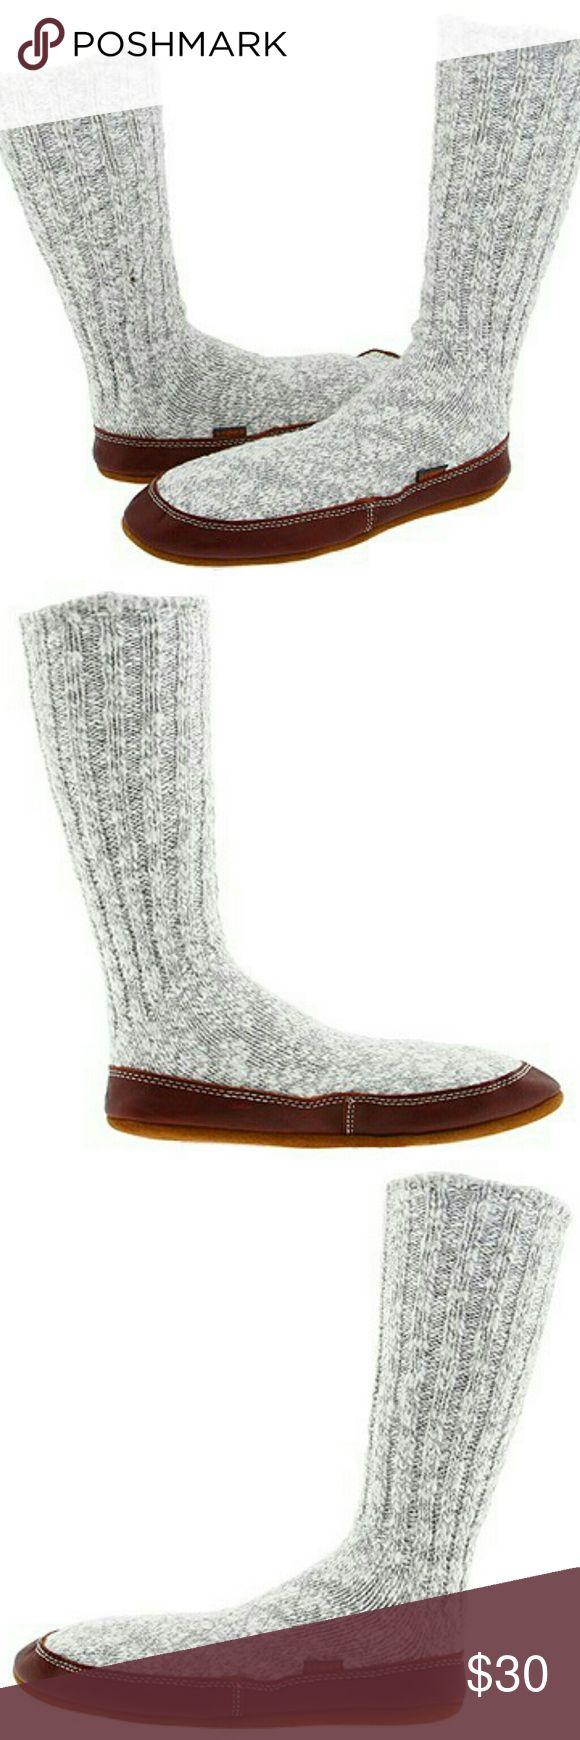 Acorn womens sock slippers Brand new super comfortable women's sock slippers Acorn Shoes Slippers